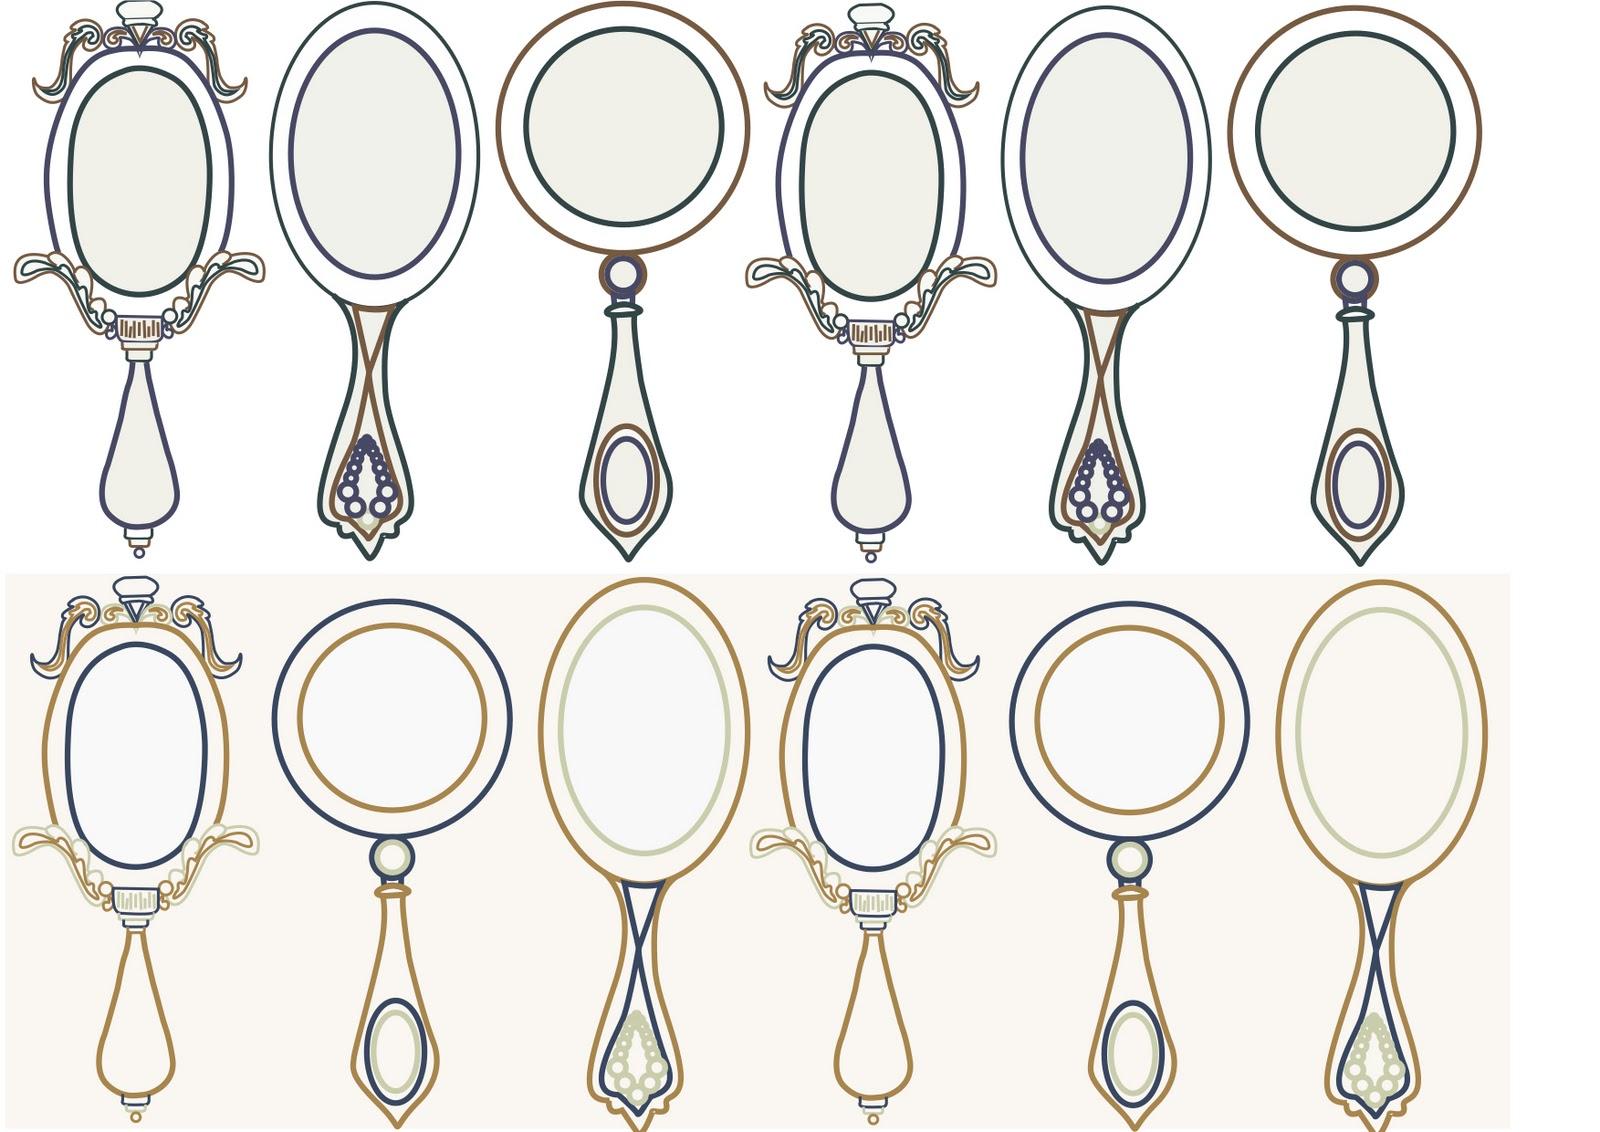 Ornate Hand Mirror Drawing Vintage Hand Held Mirror Ornate Drawing